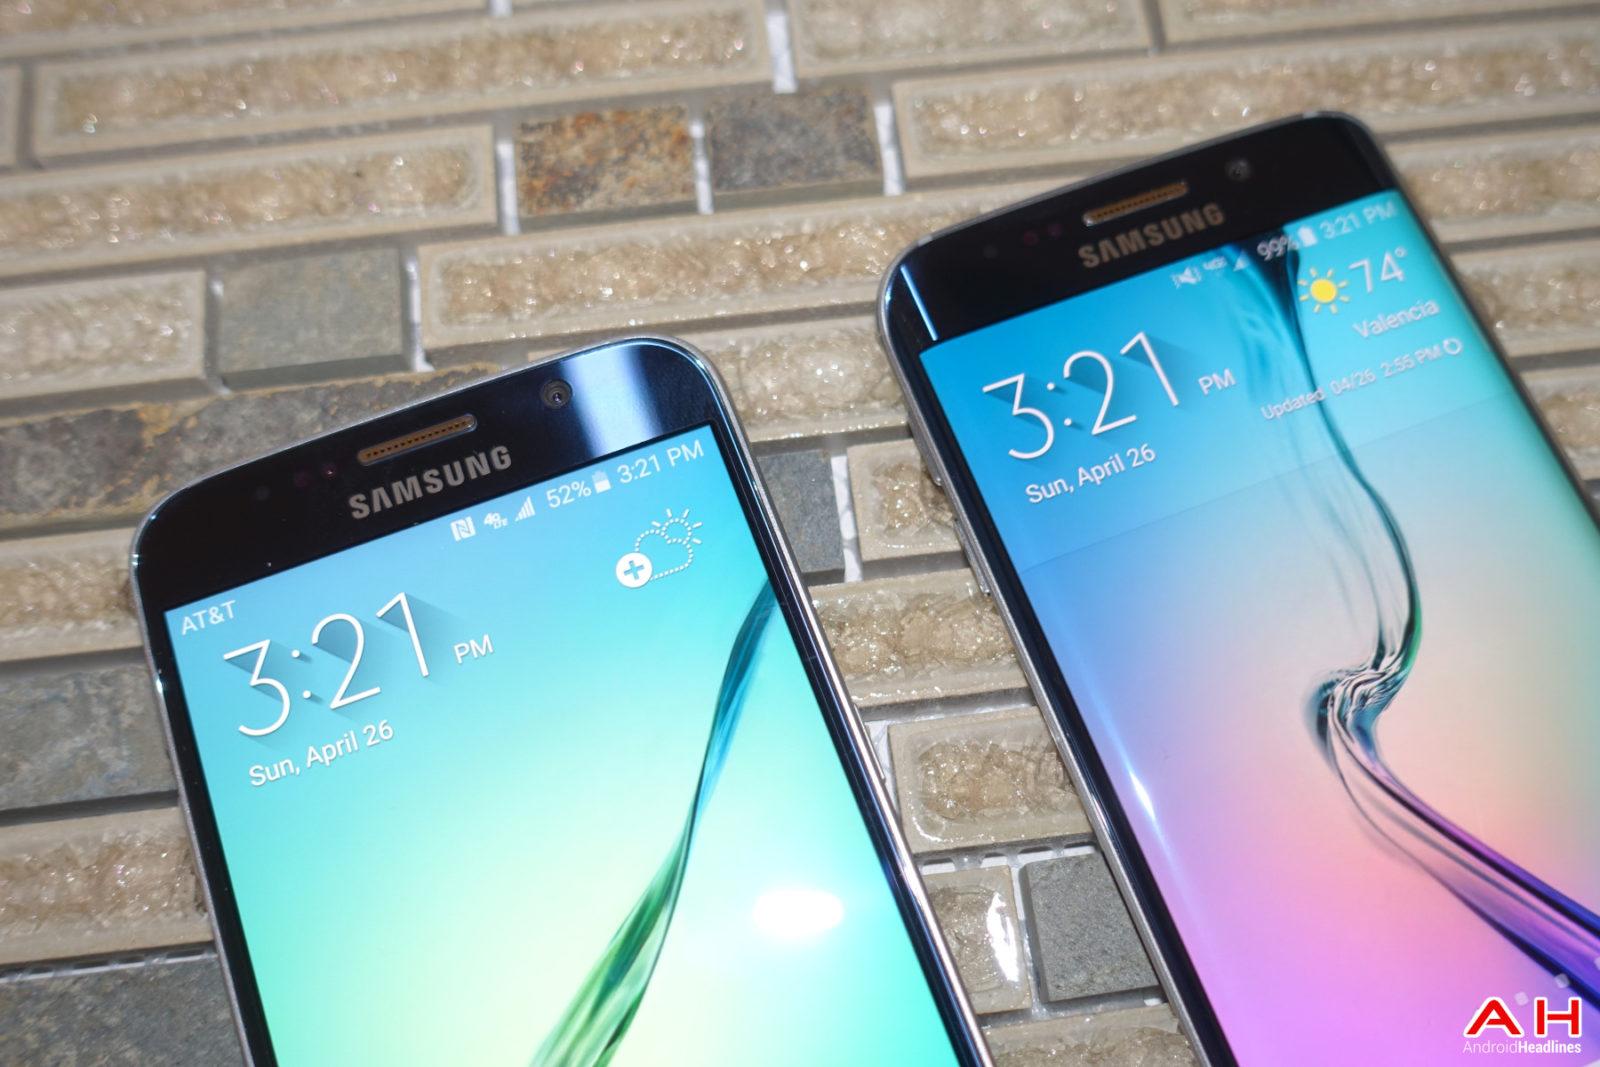 AH Samsung Galaxy S6 & Edge May 3rd - Chris-2